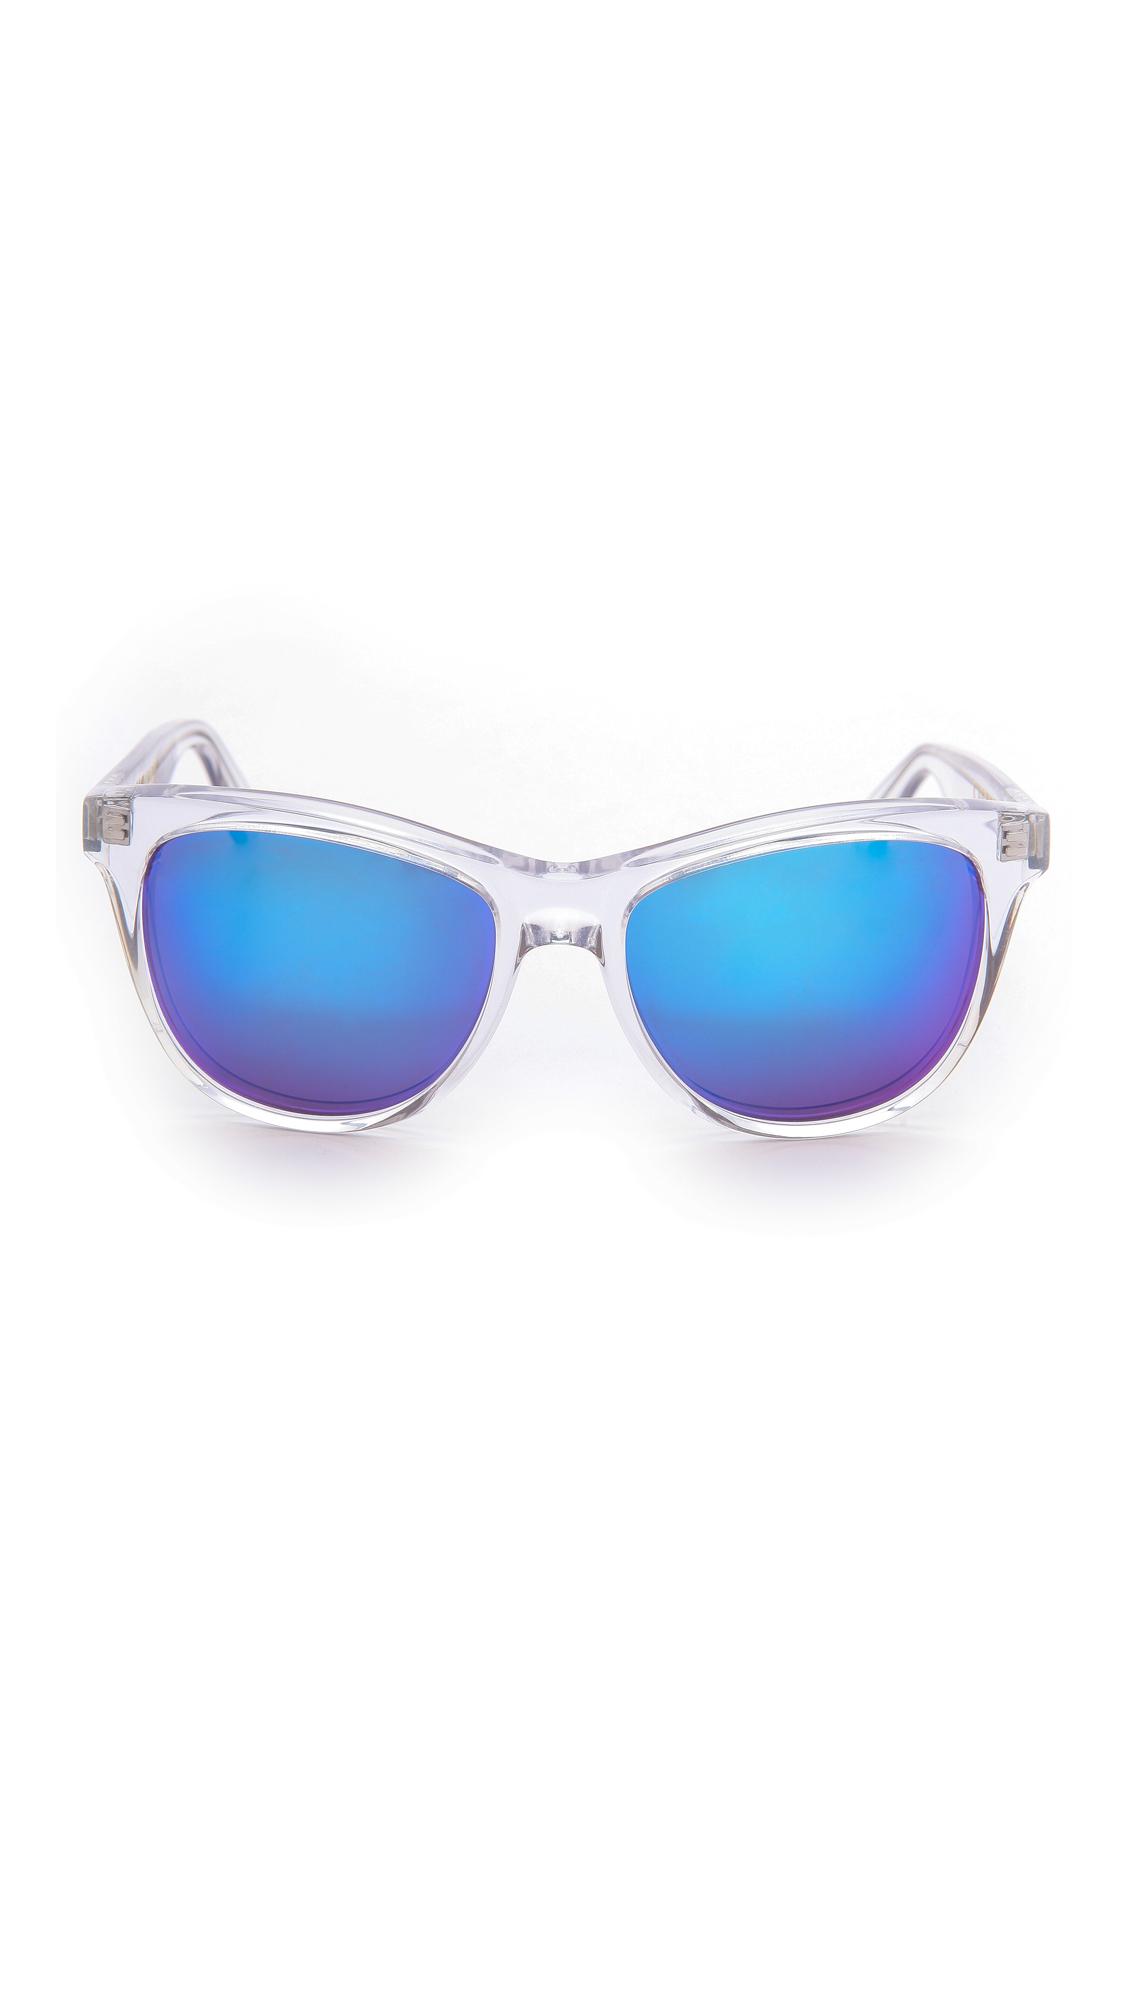 Wildfox Catfarer Deluxe Sunglasses | SHOPBOP